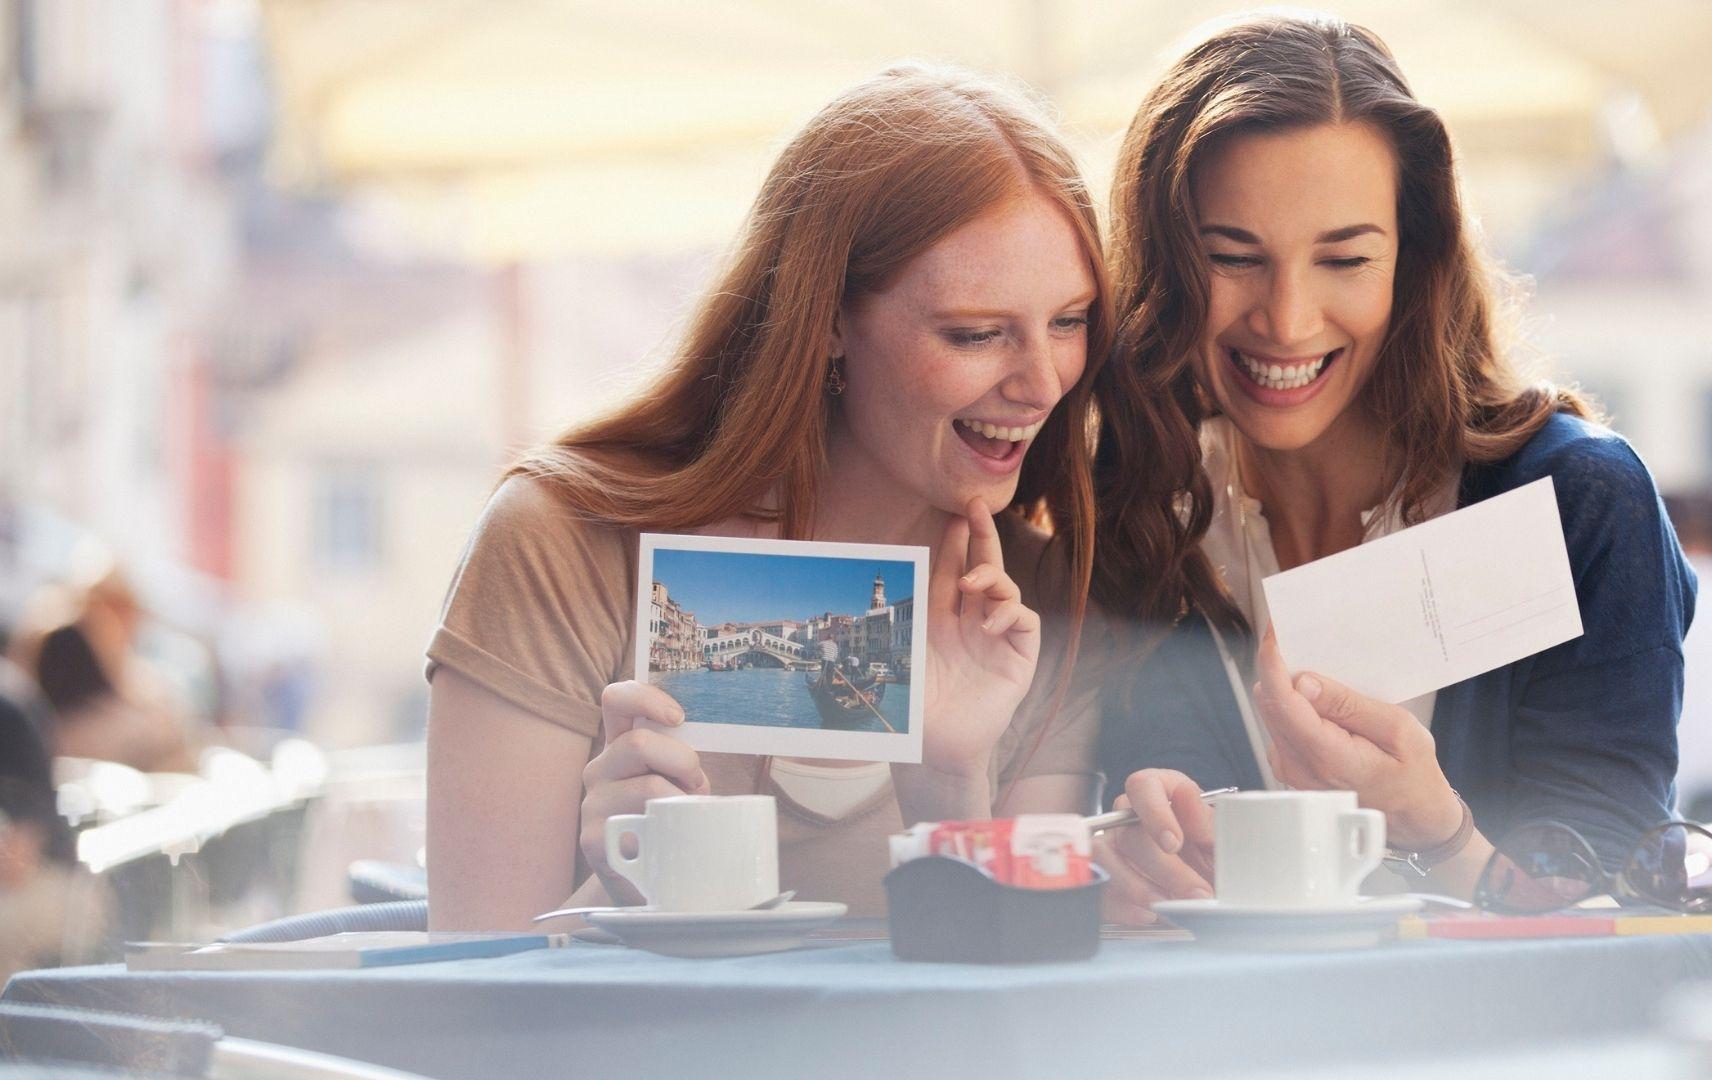 Frauen mit Postkarte im Cafe, Postando